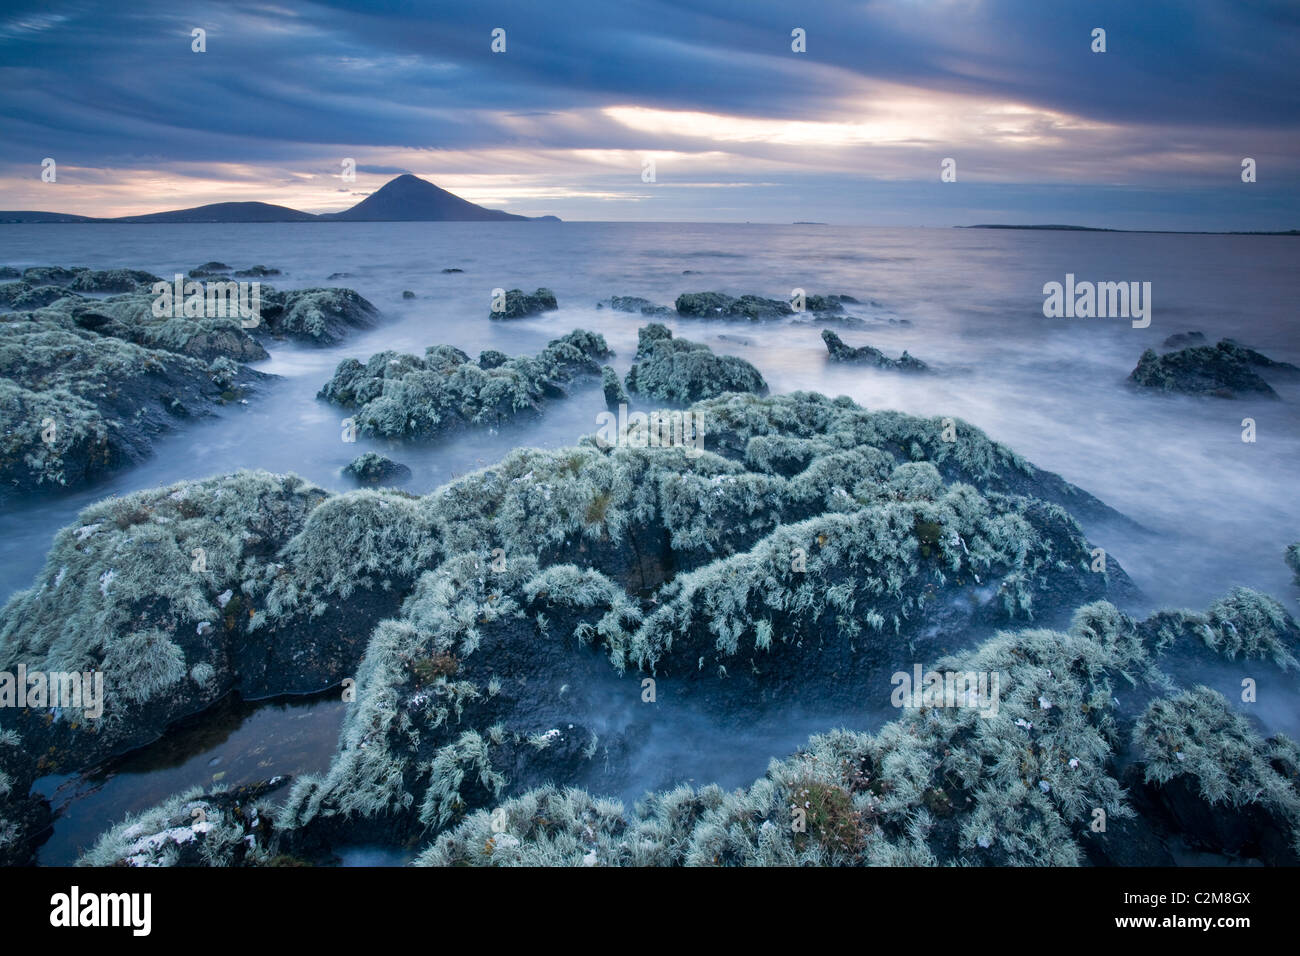 Lichen-covered rocks along the Atlantic shoreline, Ballycroy, County Mayo, Ireland. - Stock Image